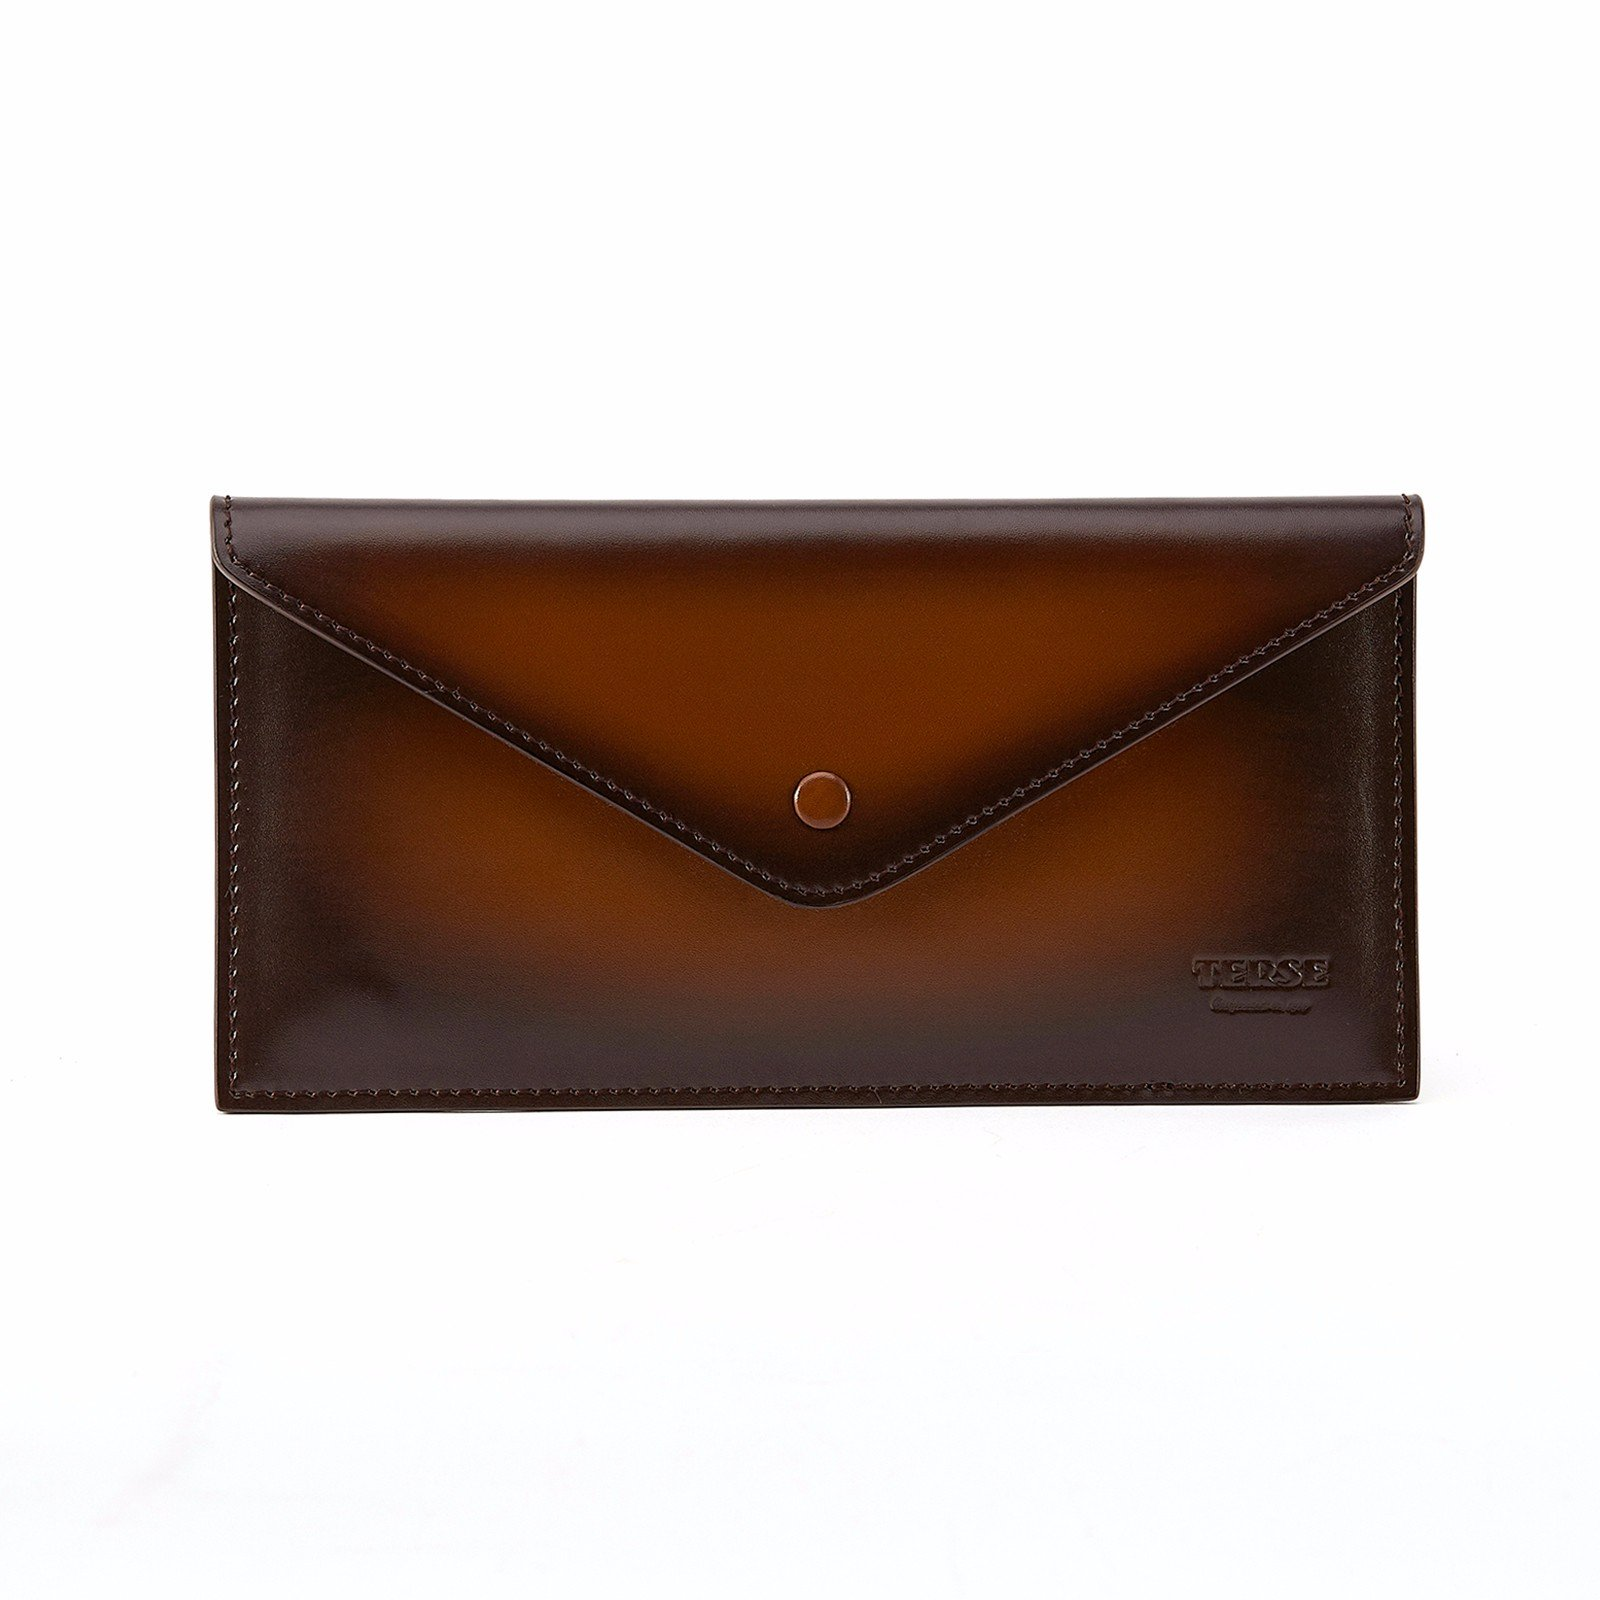 TERSE Men's Clutch Bag Leather Wallet Card Holder Messenger Bags (Tobacco)